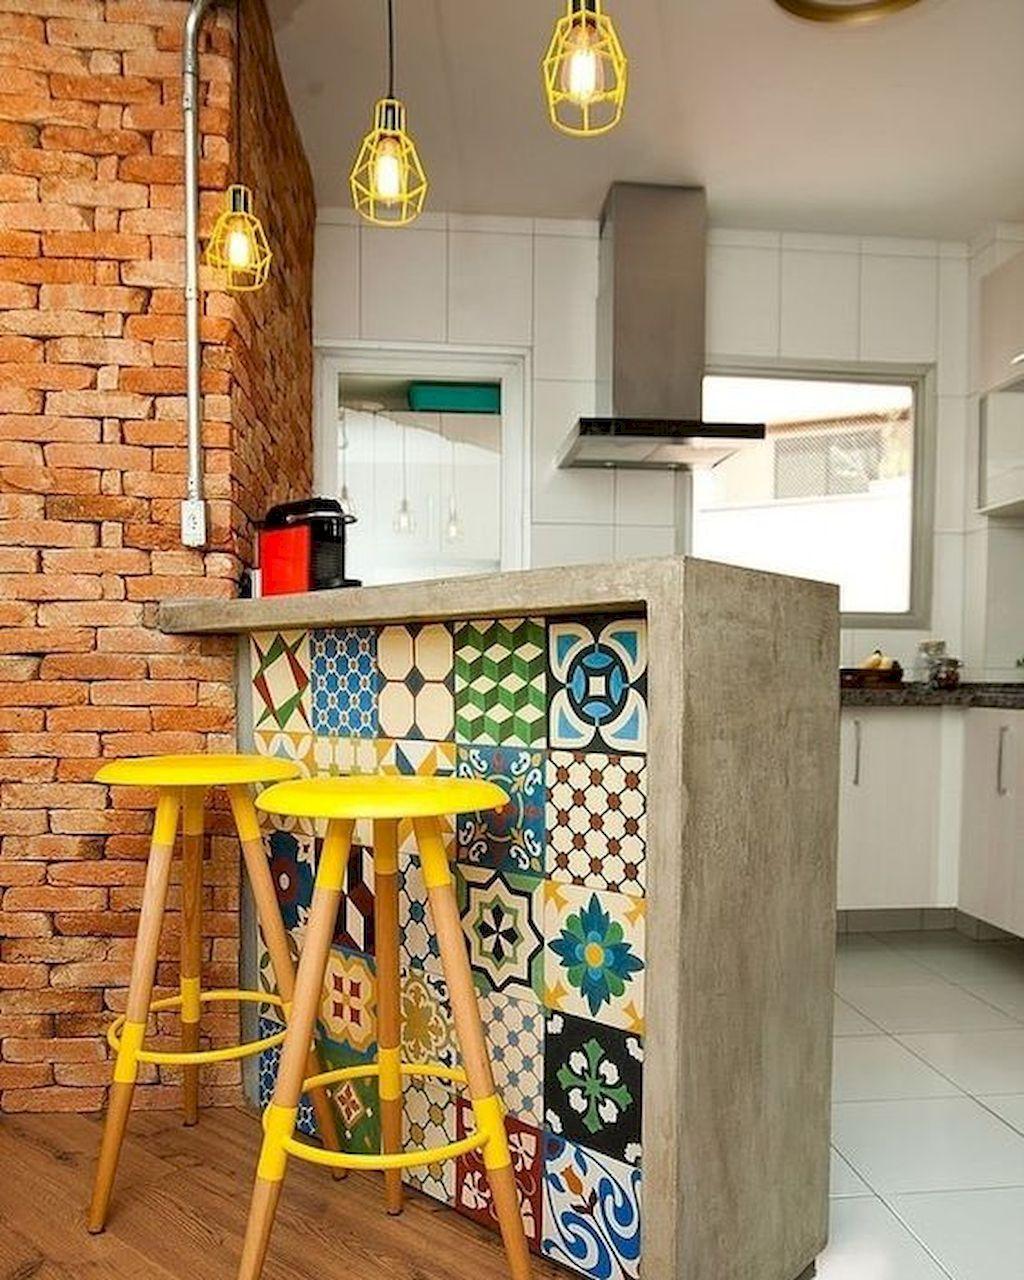 Gorgeous 15 Affordable Farmhouse Kitchen Ideas on A Budget source